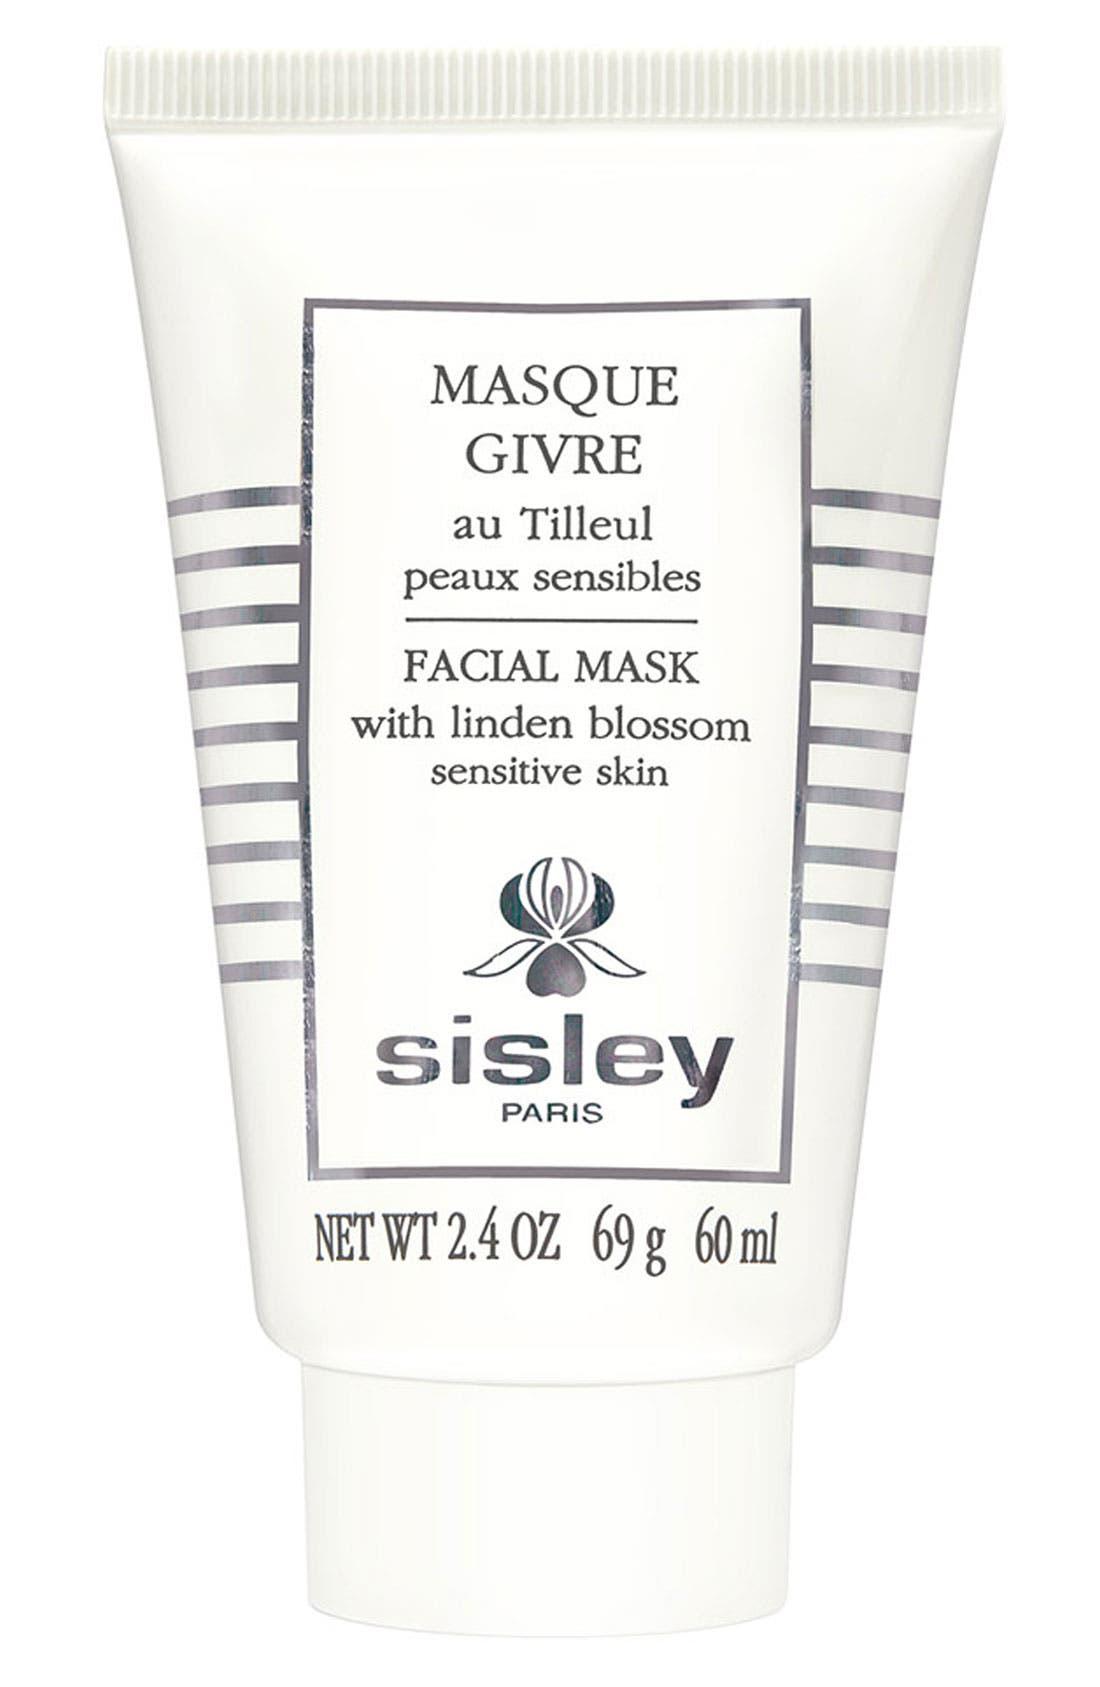 Sisley Paris Facial Mask with Linden Blossom